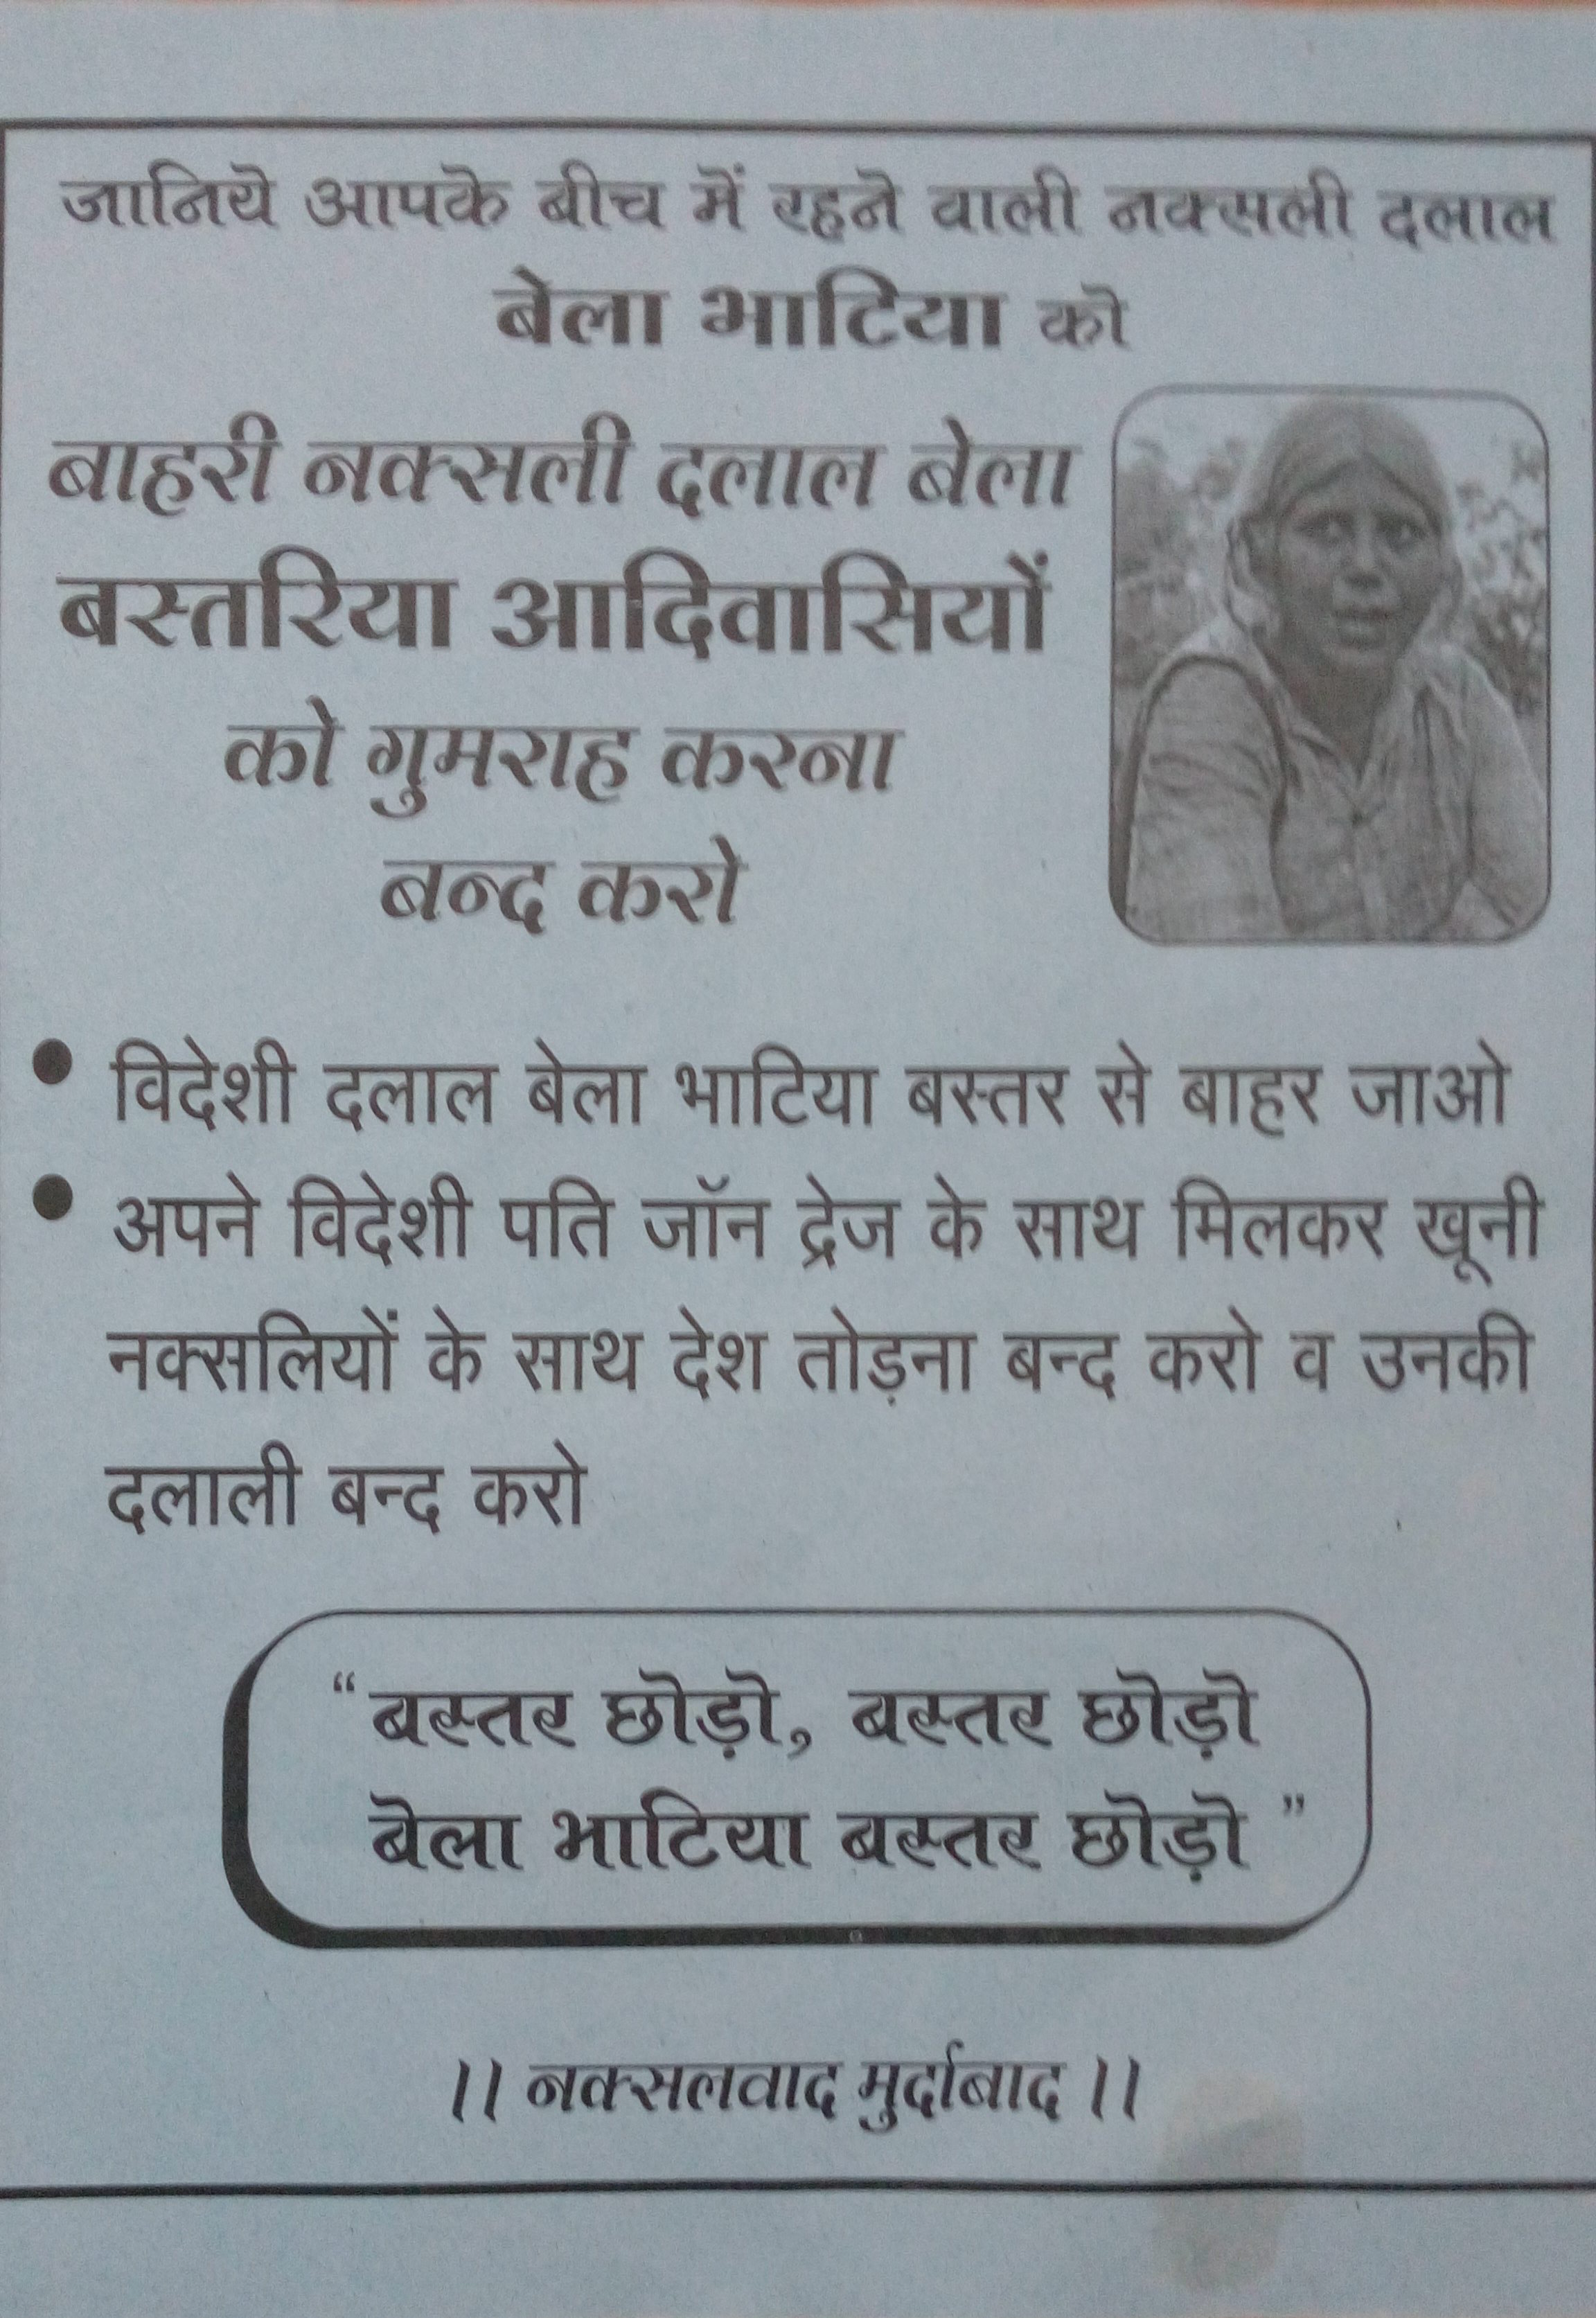 A pamphlet against social scientist Bela Bhatia distributed in Dantewada